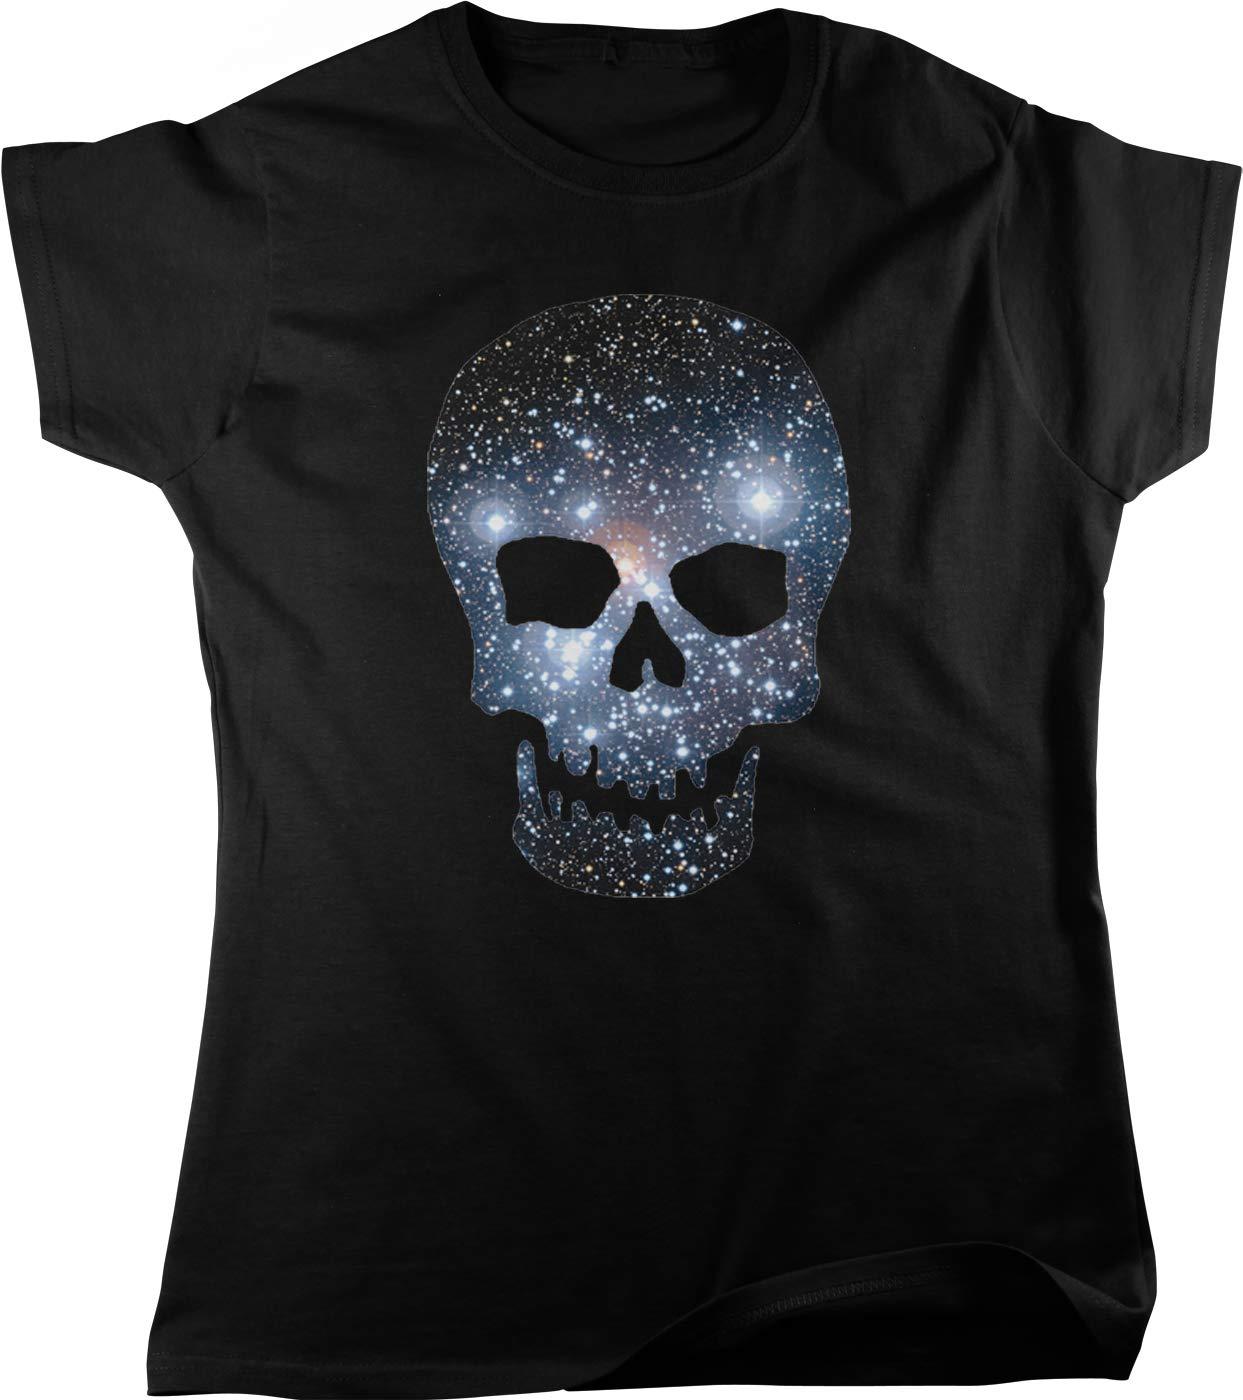 Hoodteez Galaxy Pattern Skull, Space Skull Women's T-Shirt